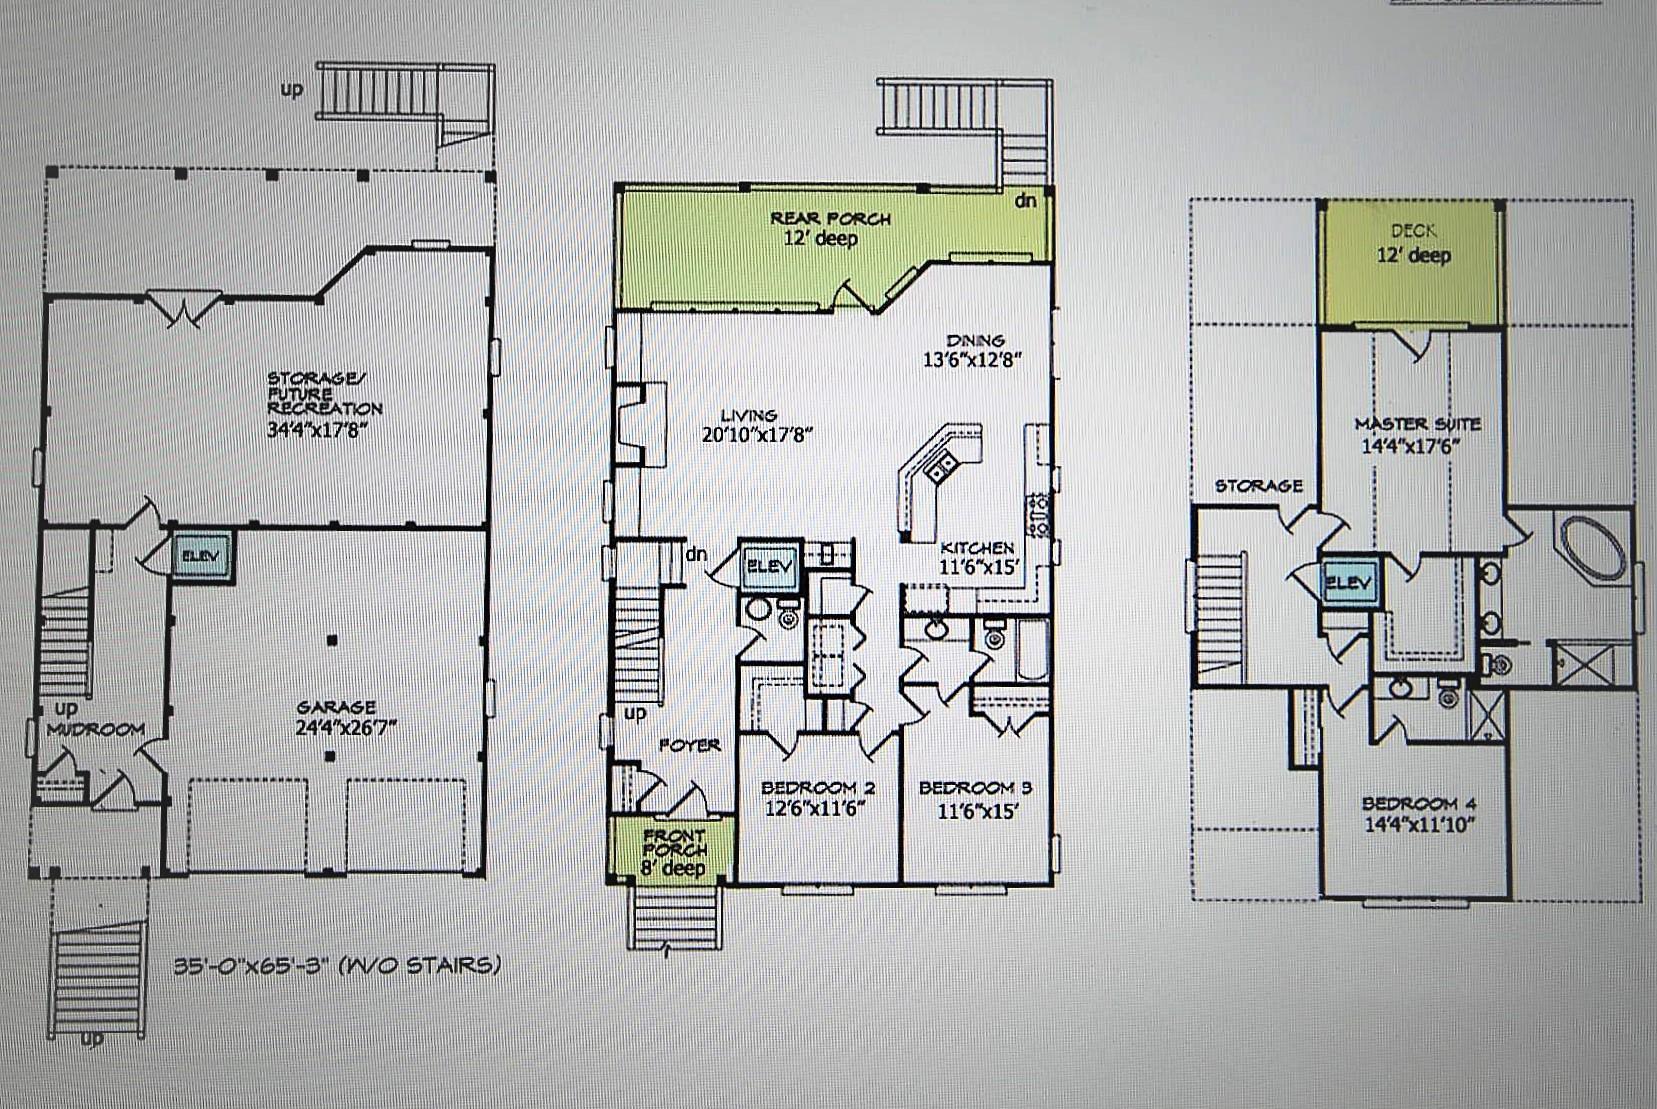 Home for sale 1013 Recess Road, Berkeley Hills, Hanahan, SC